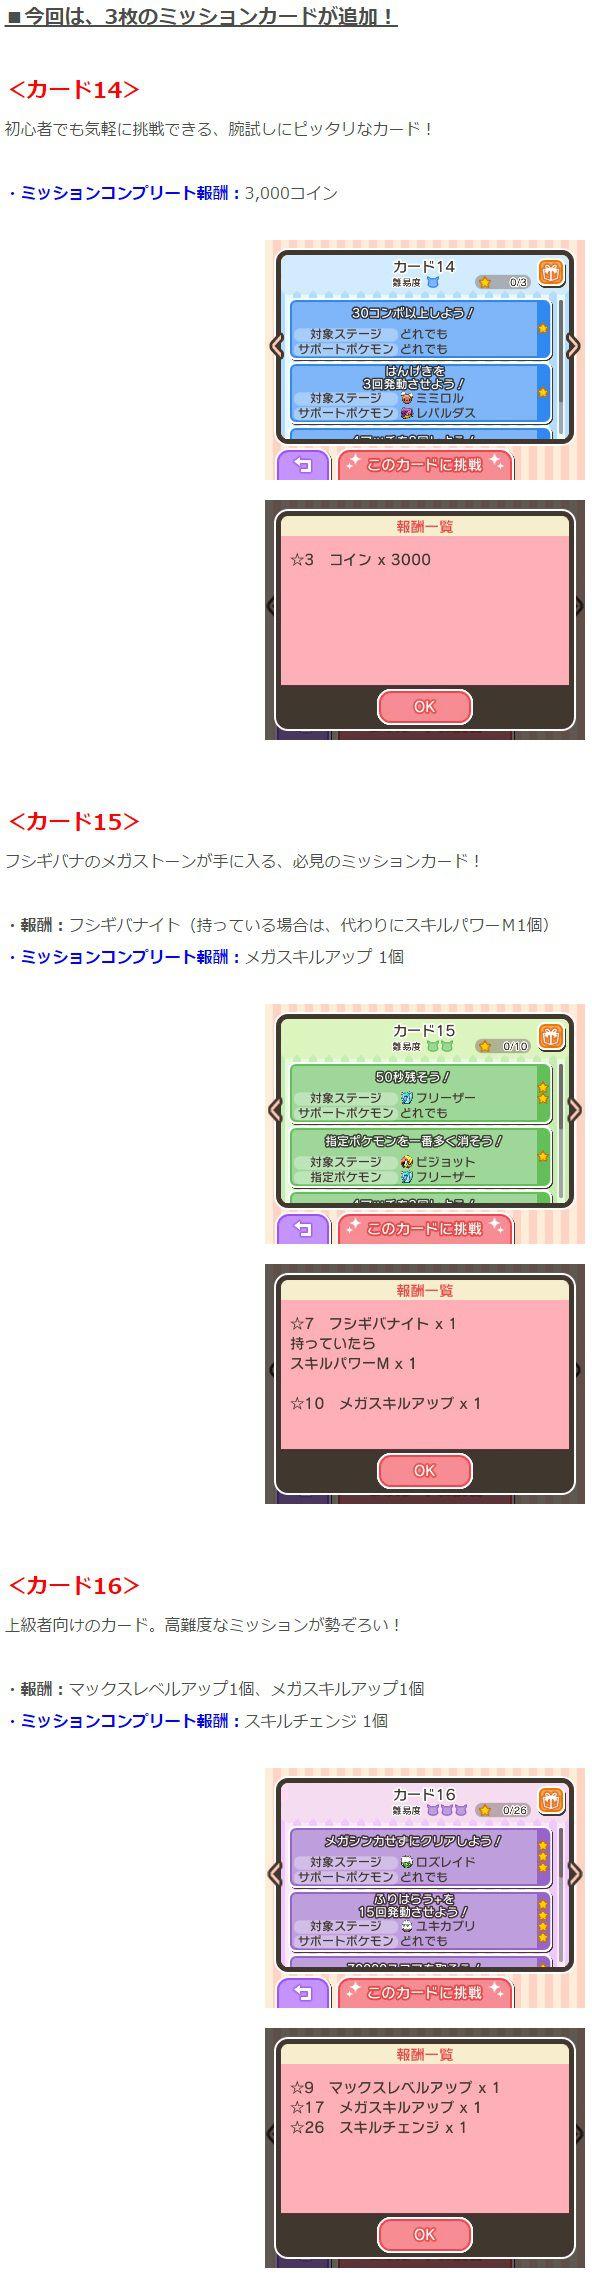 image_6602.jpg